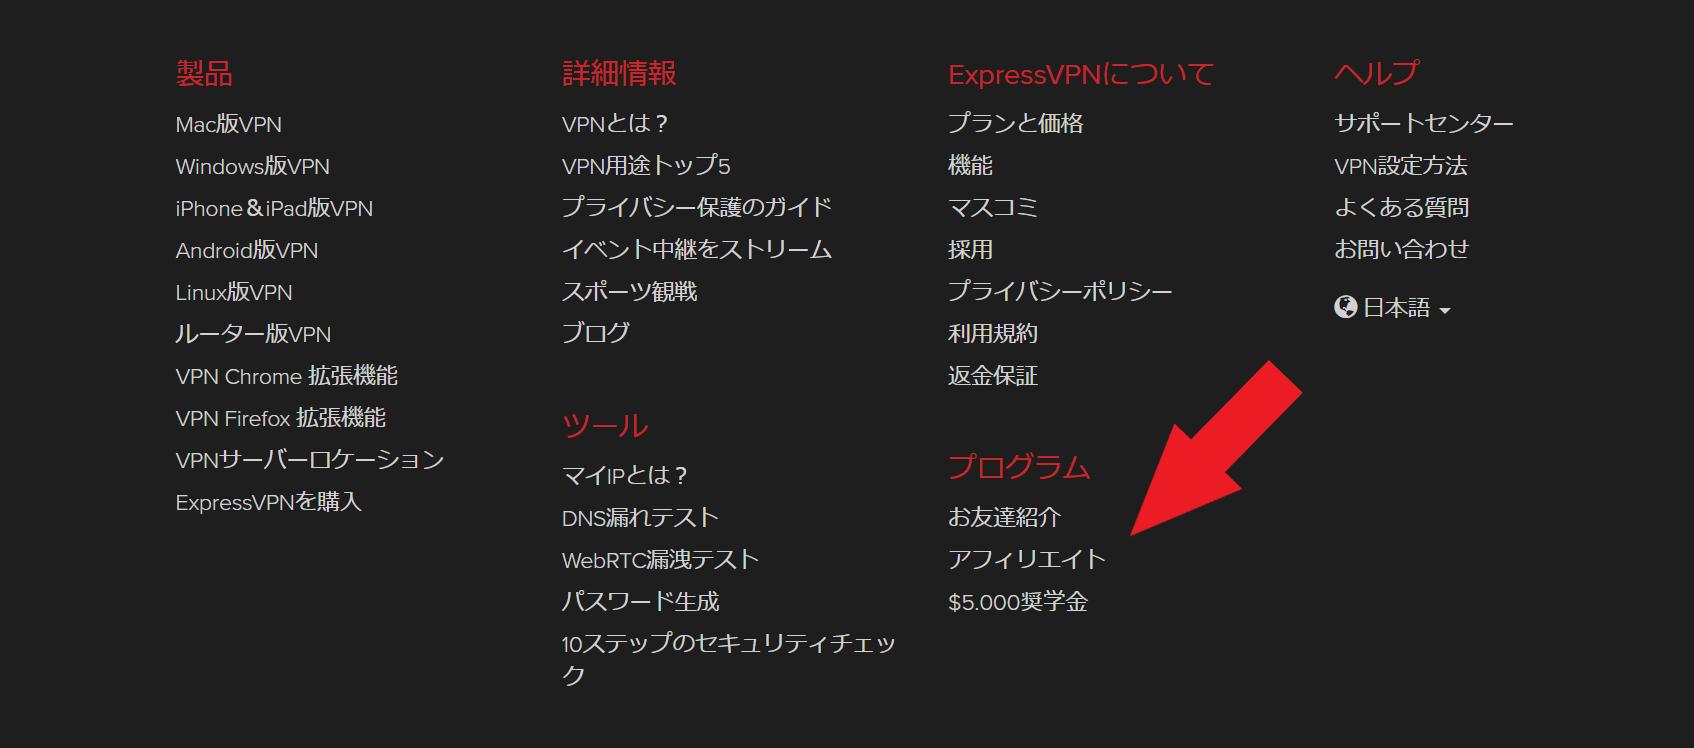 expressvpnのアフィリエイトプログラム